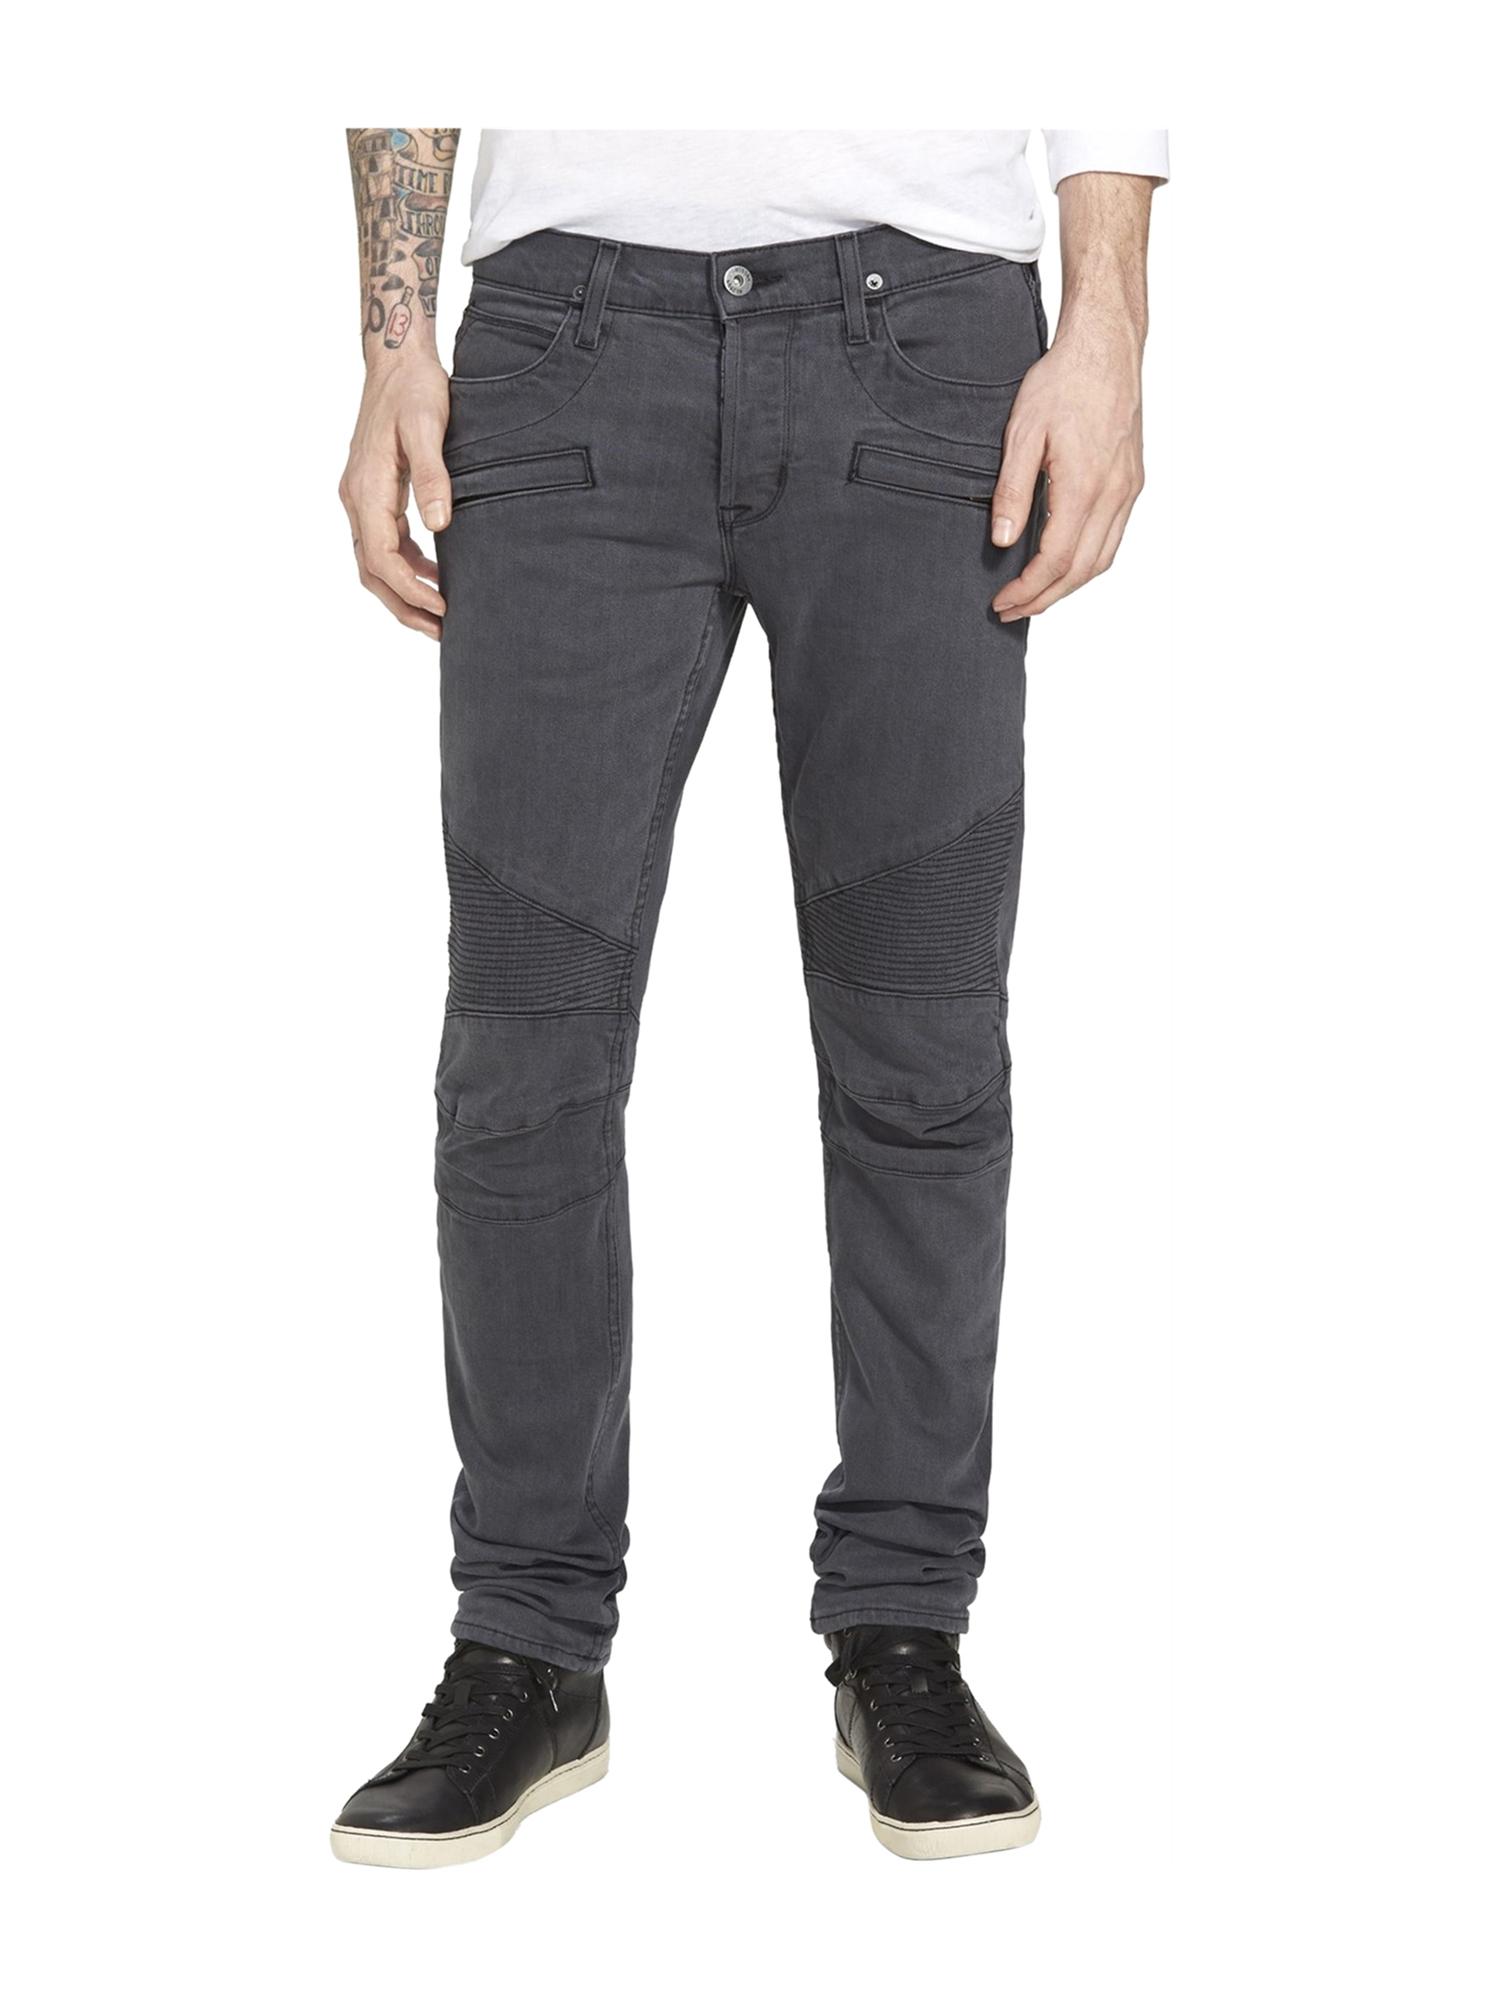 Hudson Mens Biker Skinny Fit Jeans abys 34x34